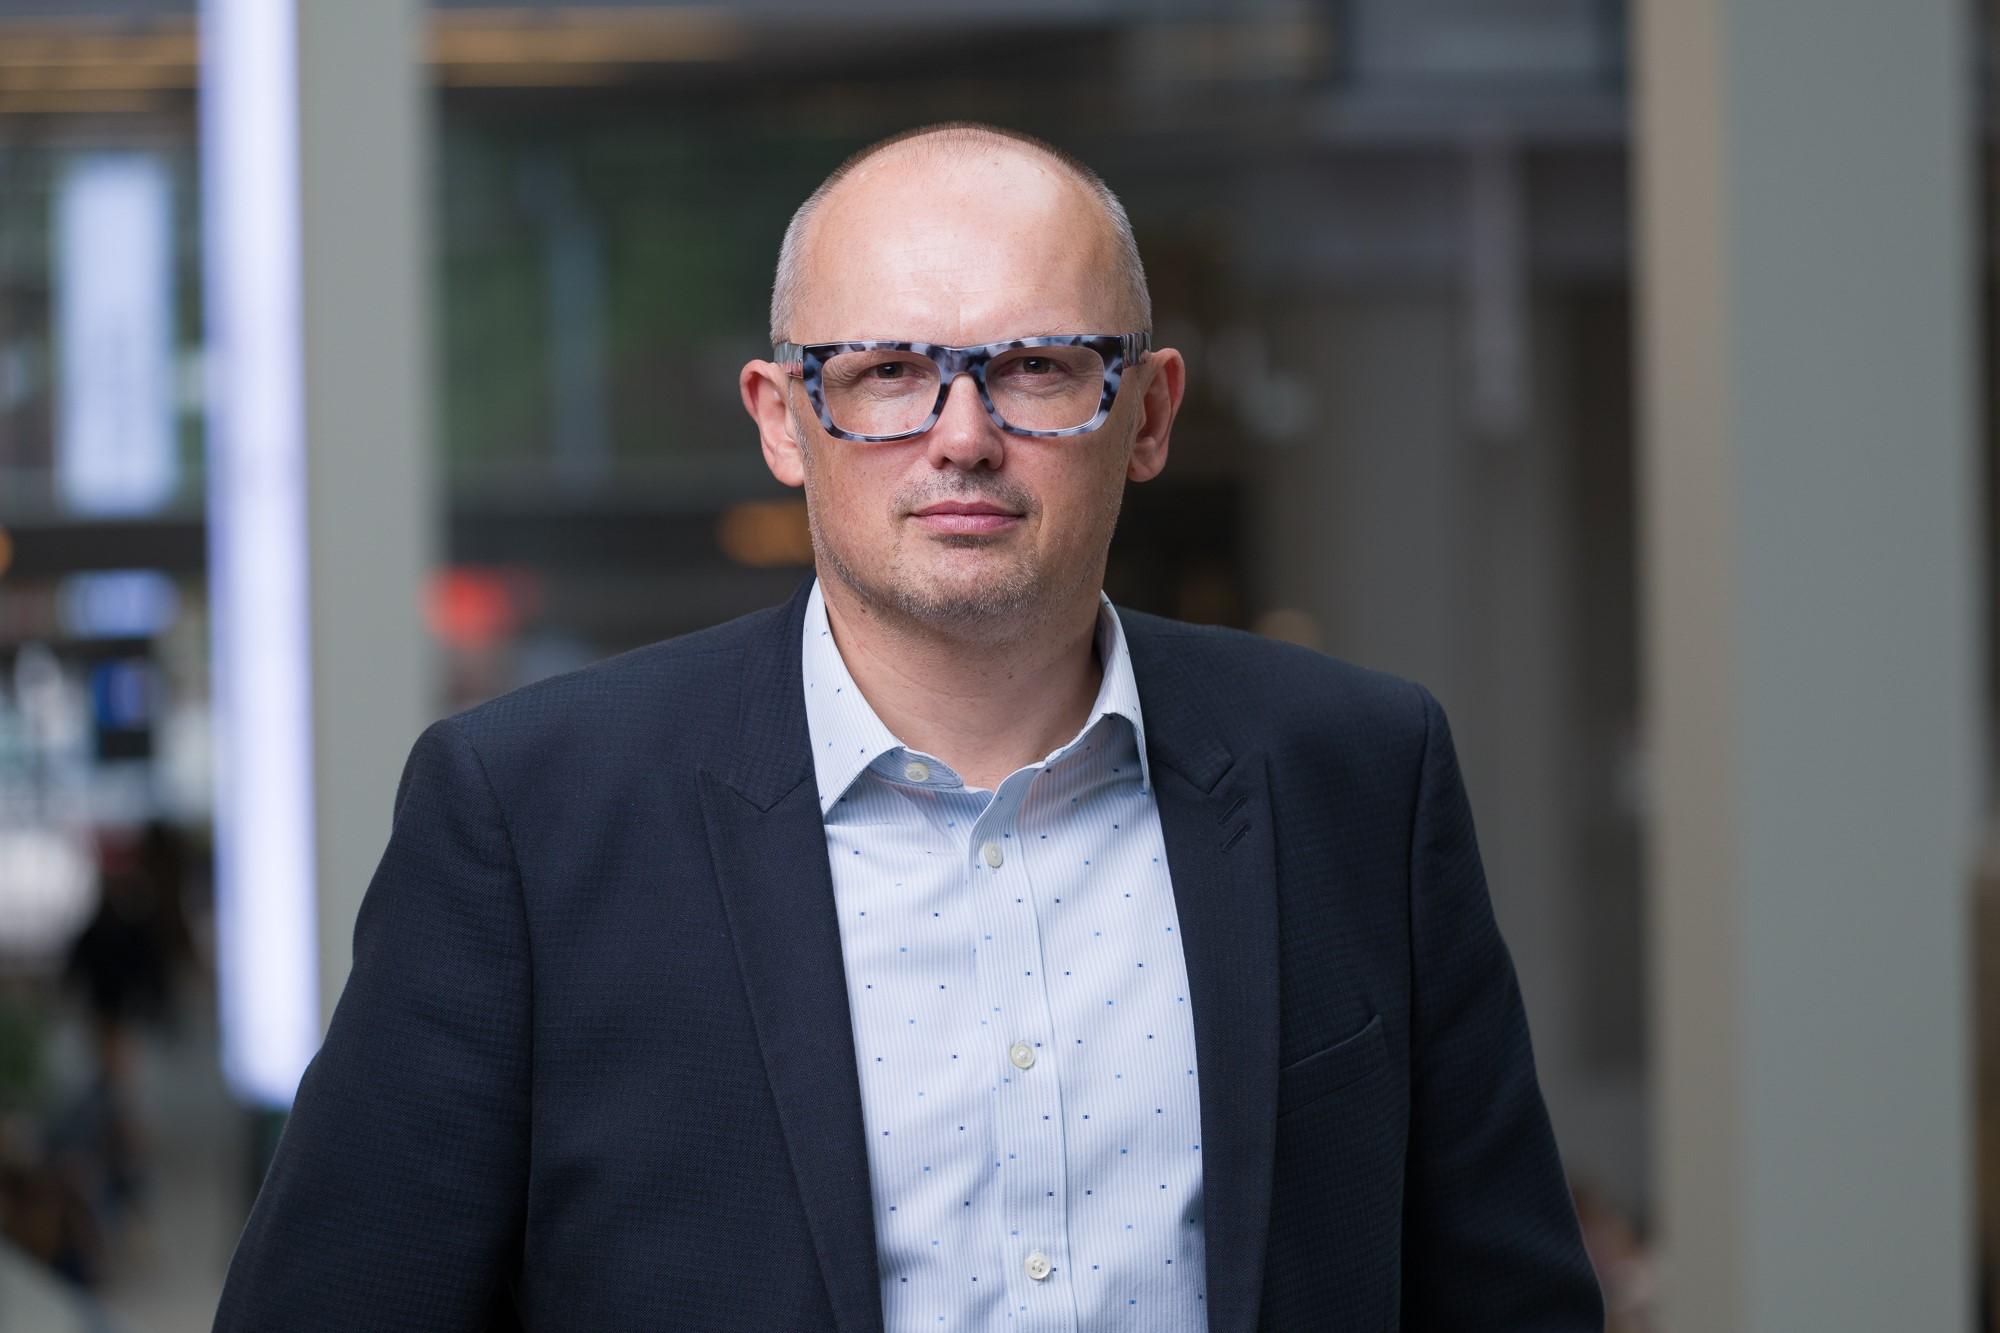 Jon Worren - Lead Executive, Venture and Corporate Programs